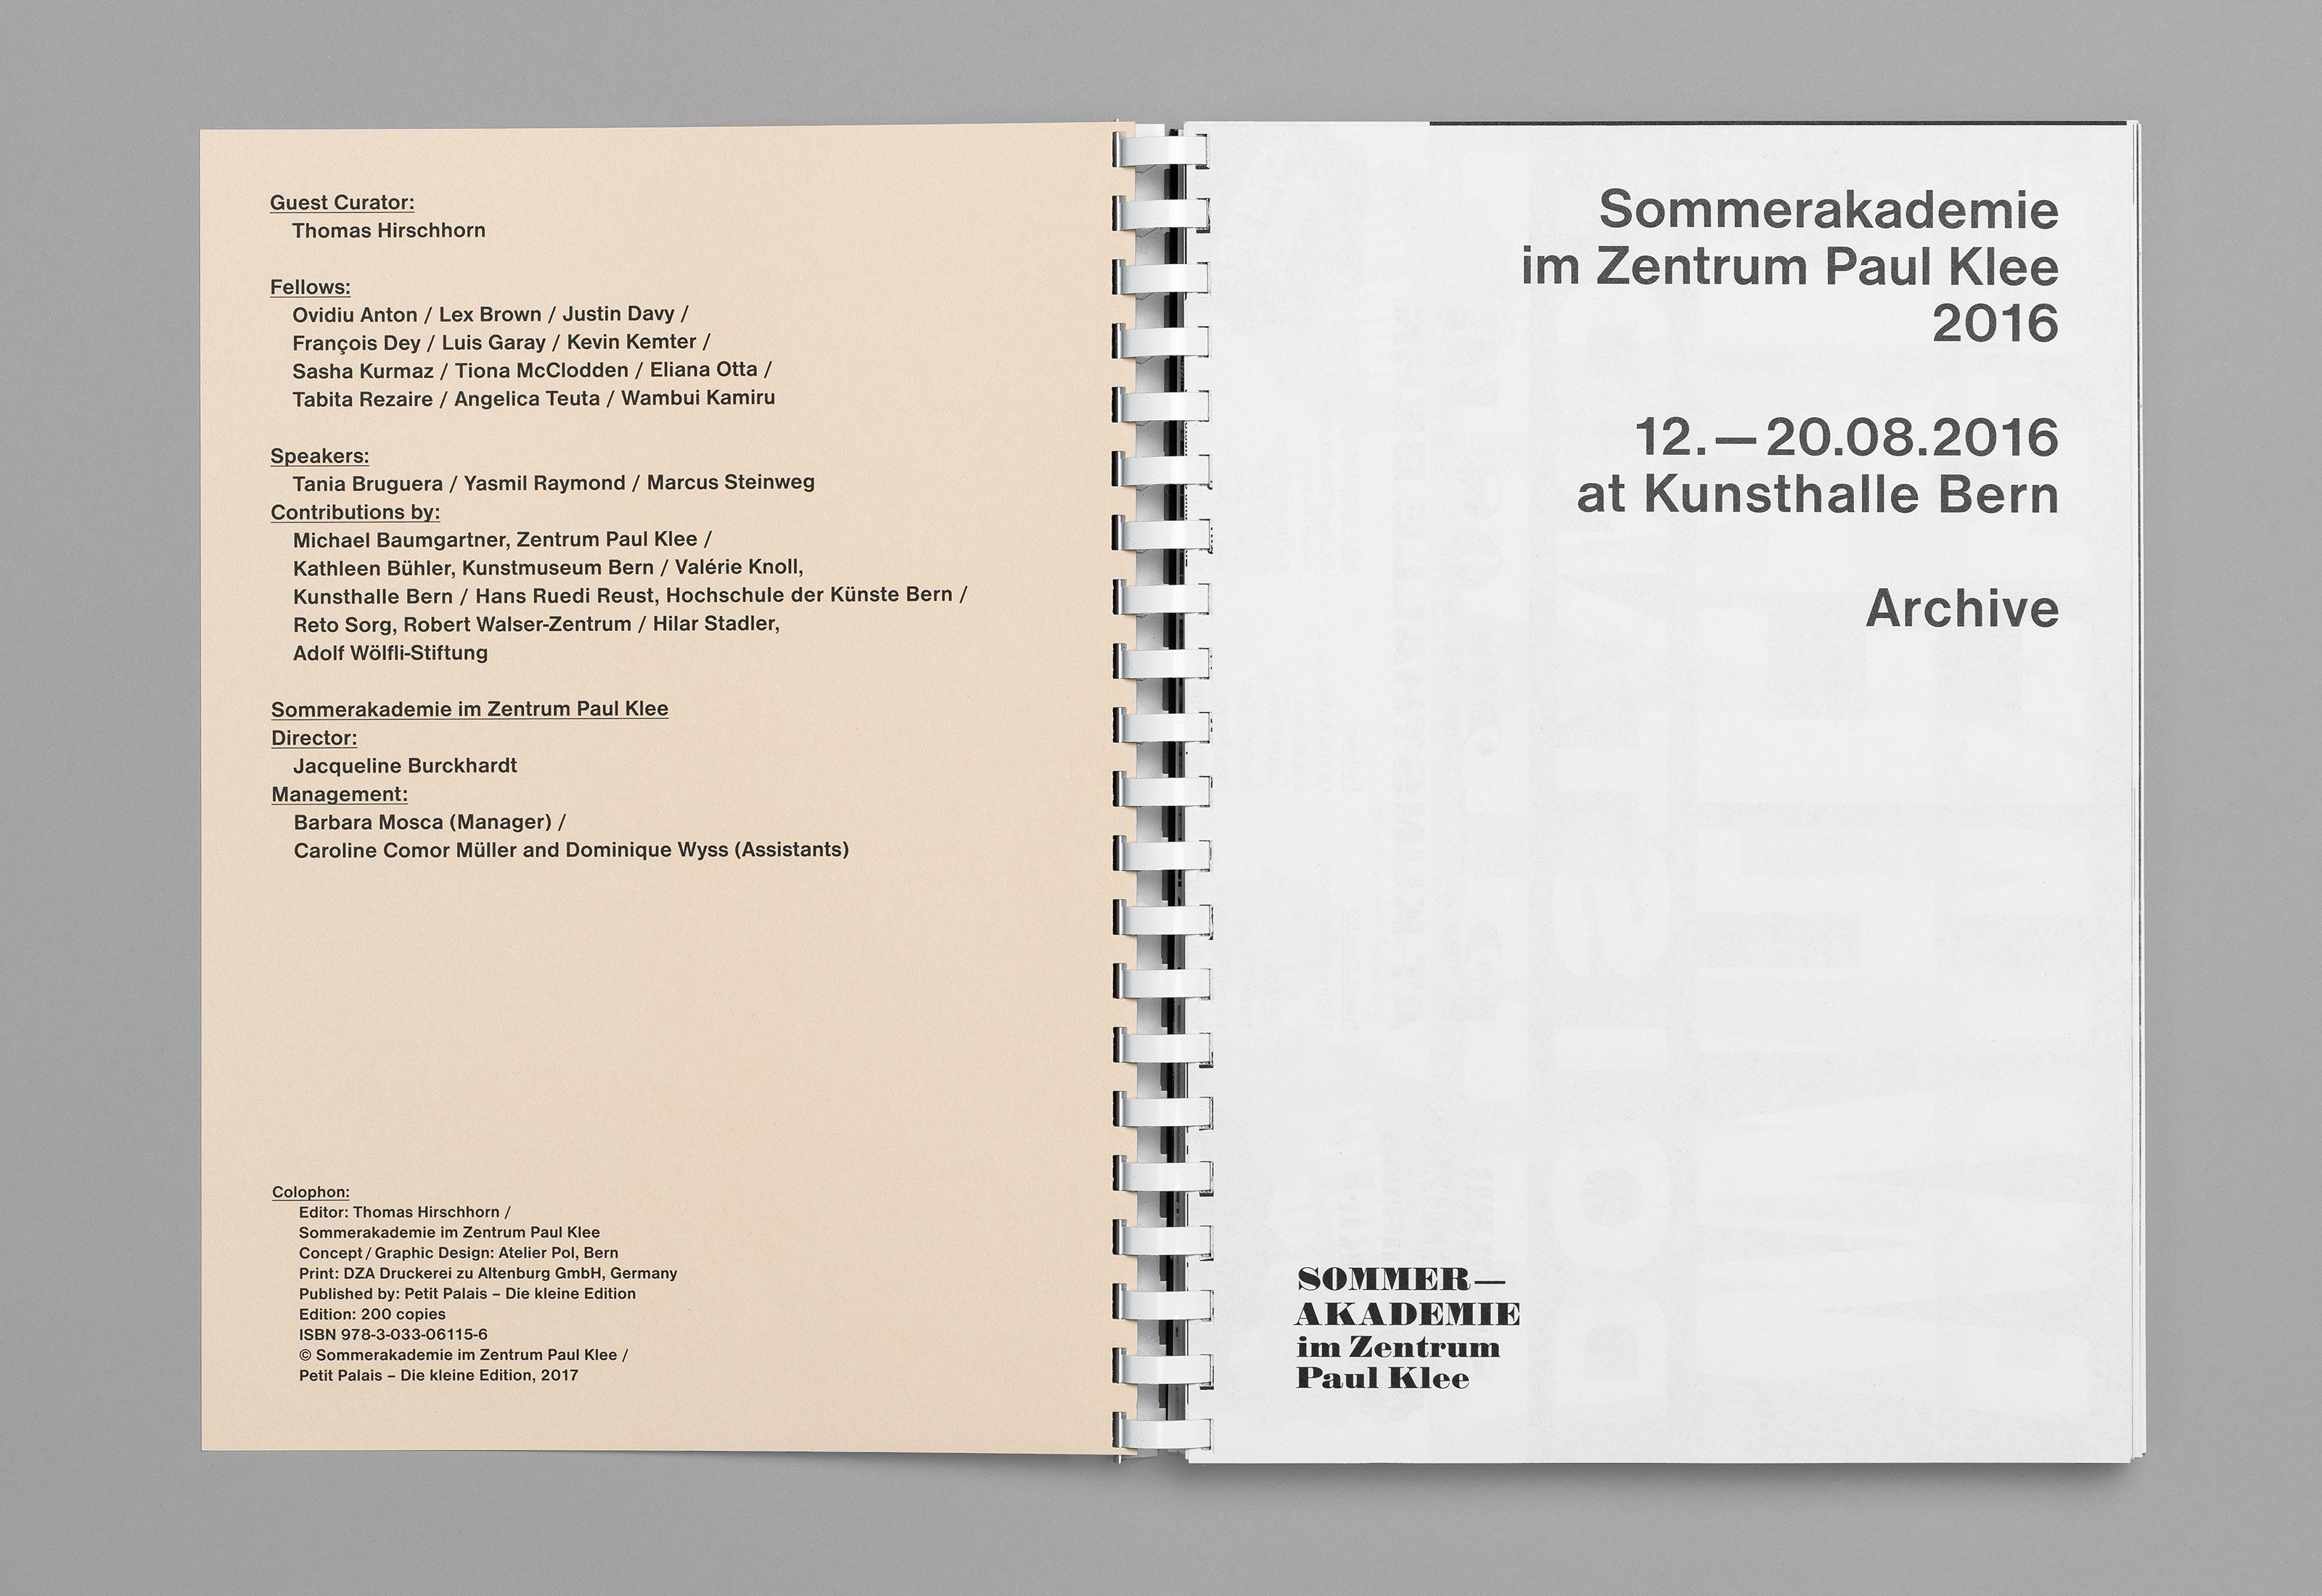 Sommerakademie im Zentrum Paul Klee 2016 – Publikation Thomas Hirschhorn, colophon  ©Atelier Pol